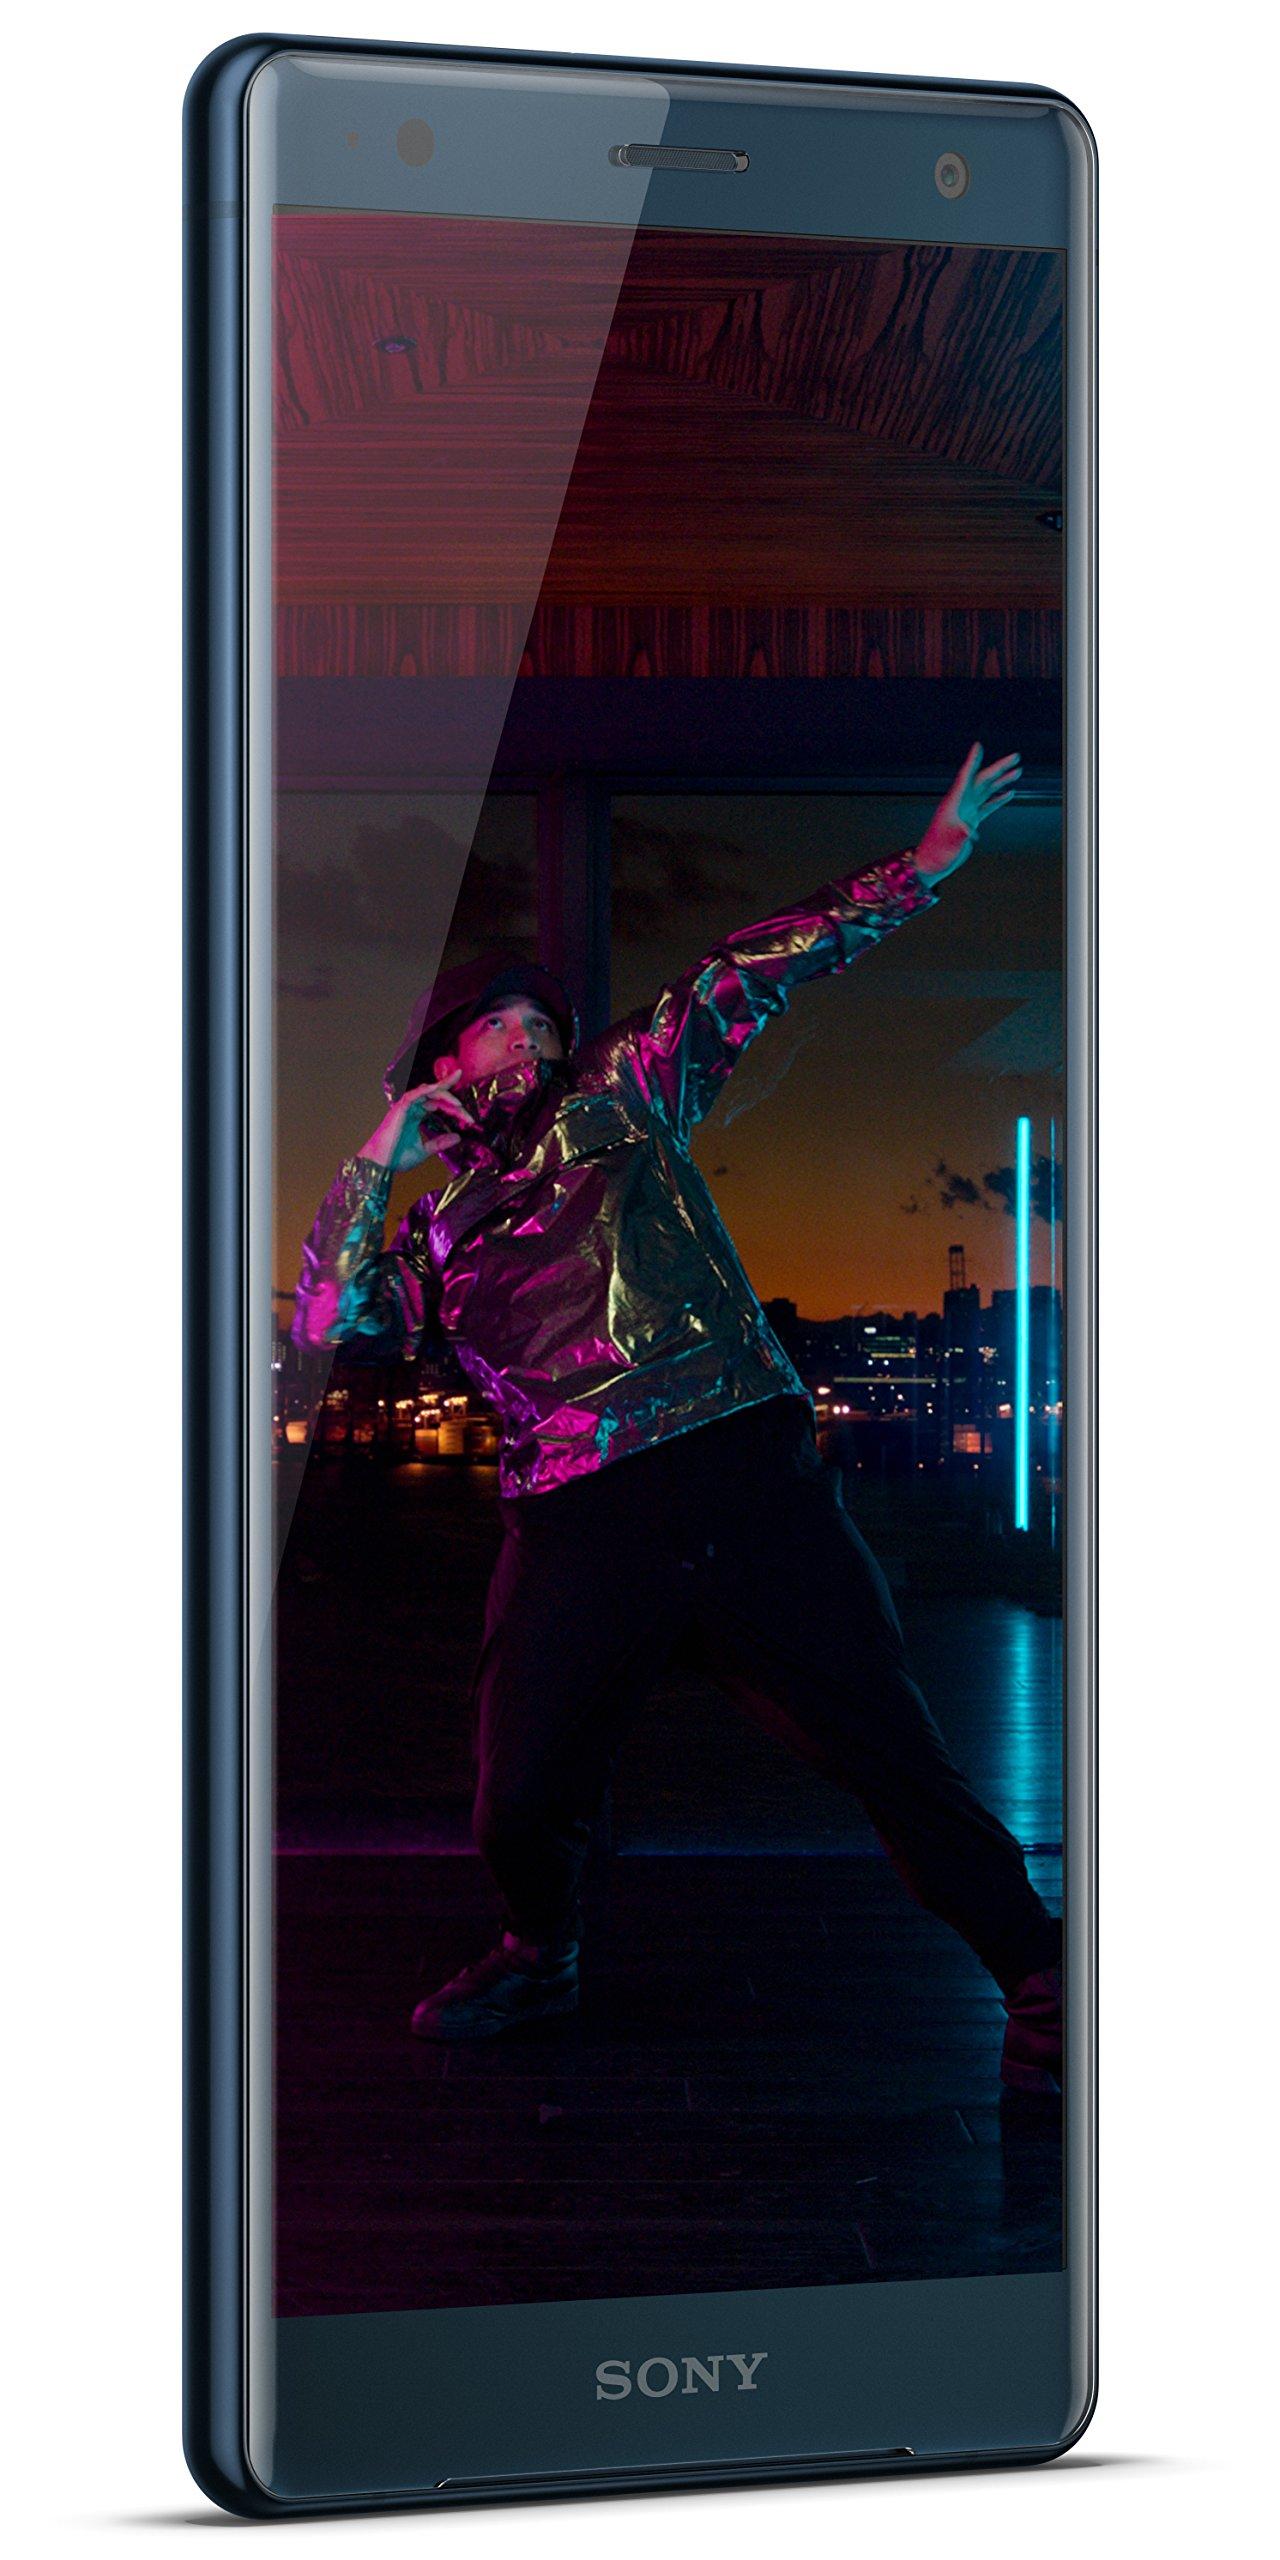 Sony Xperia XZ2 Unlocked Smartphone - 5.7'' Screen - 64GB - Deep Green (US Warranty)